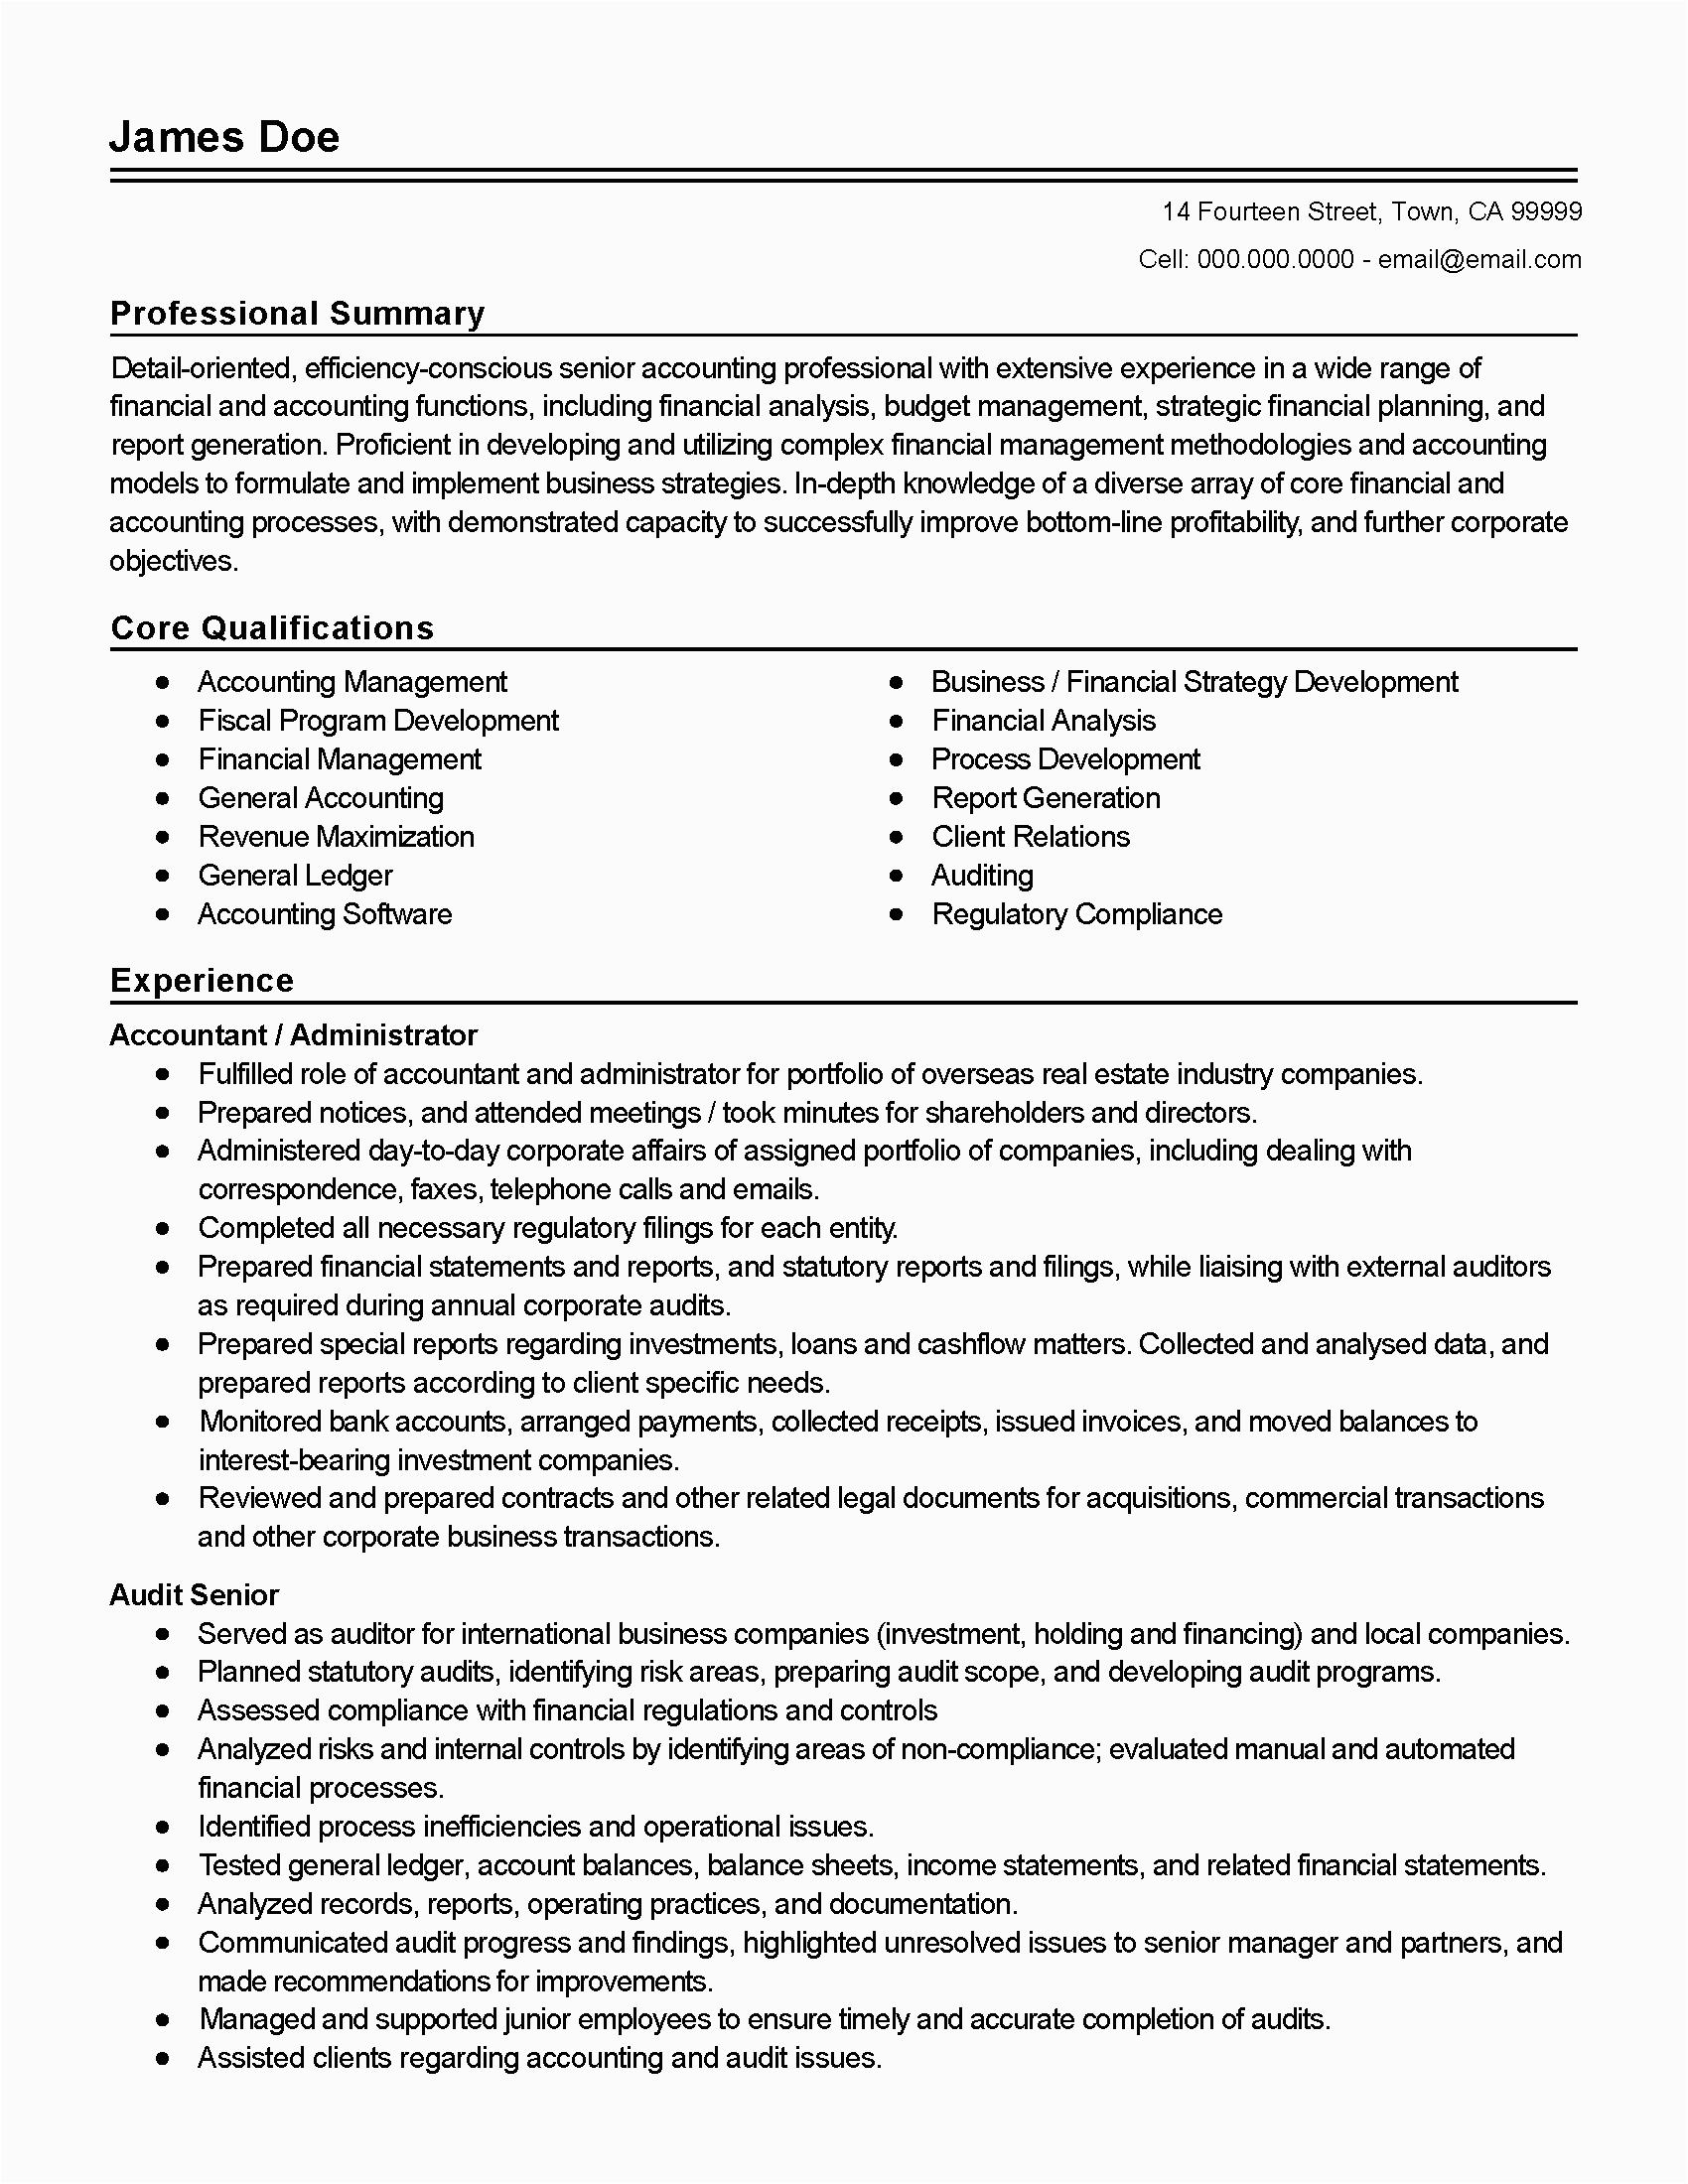 professional accountant resume database